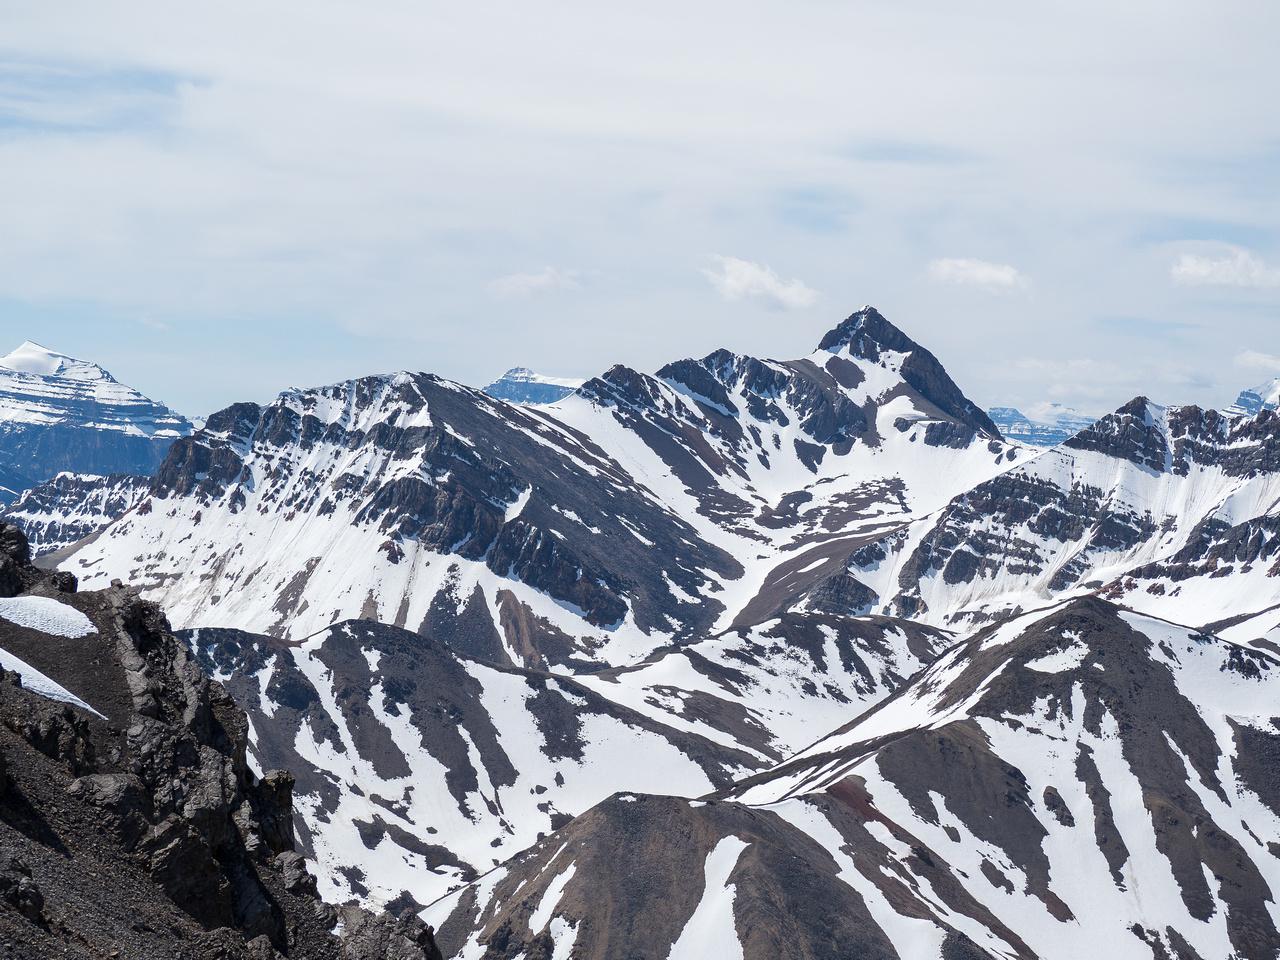 Whirlpool Ridge.